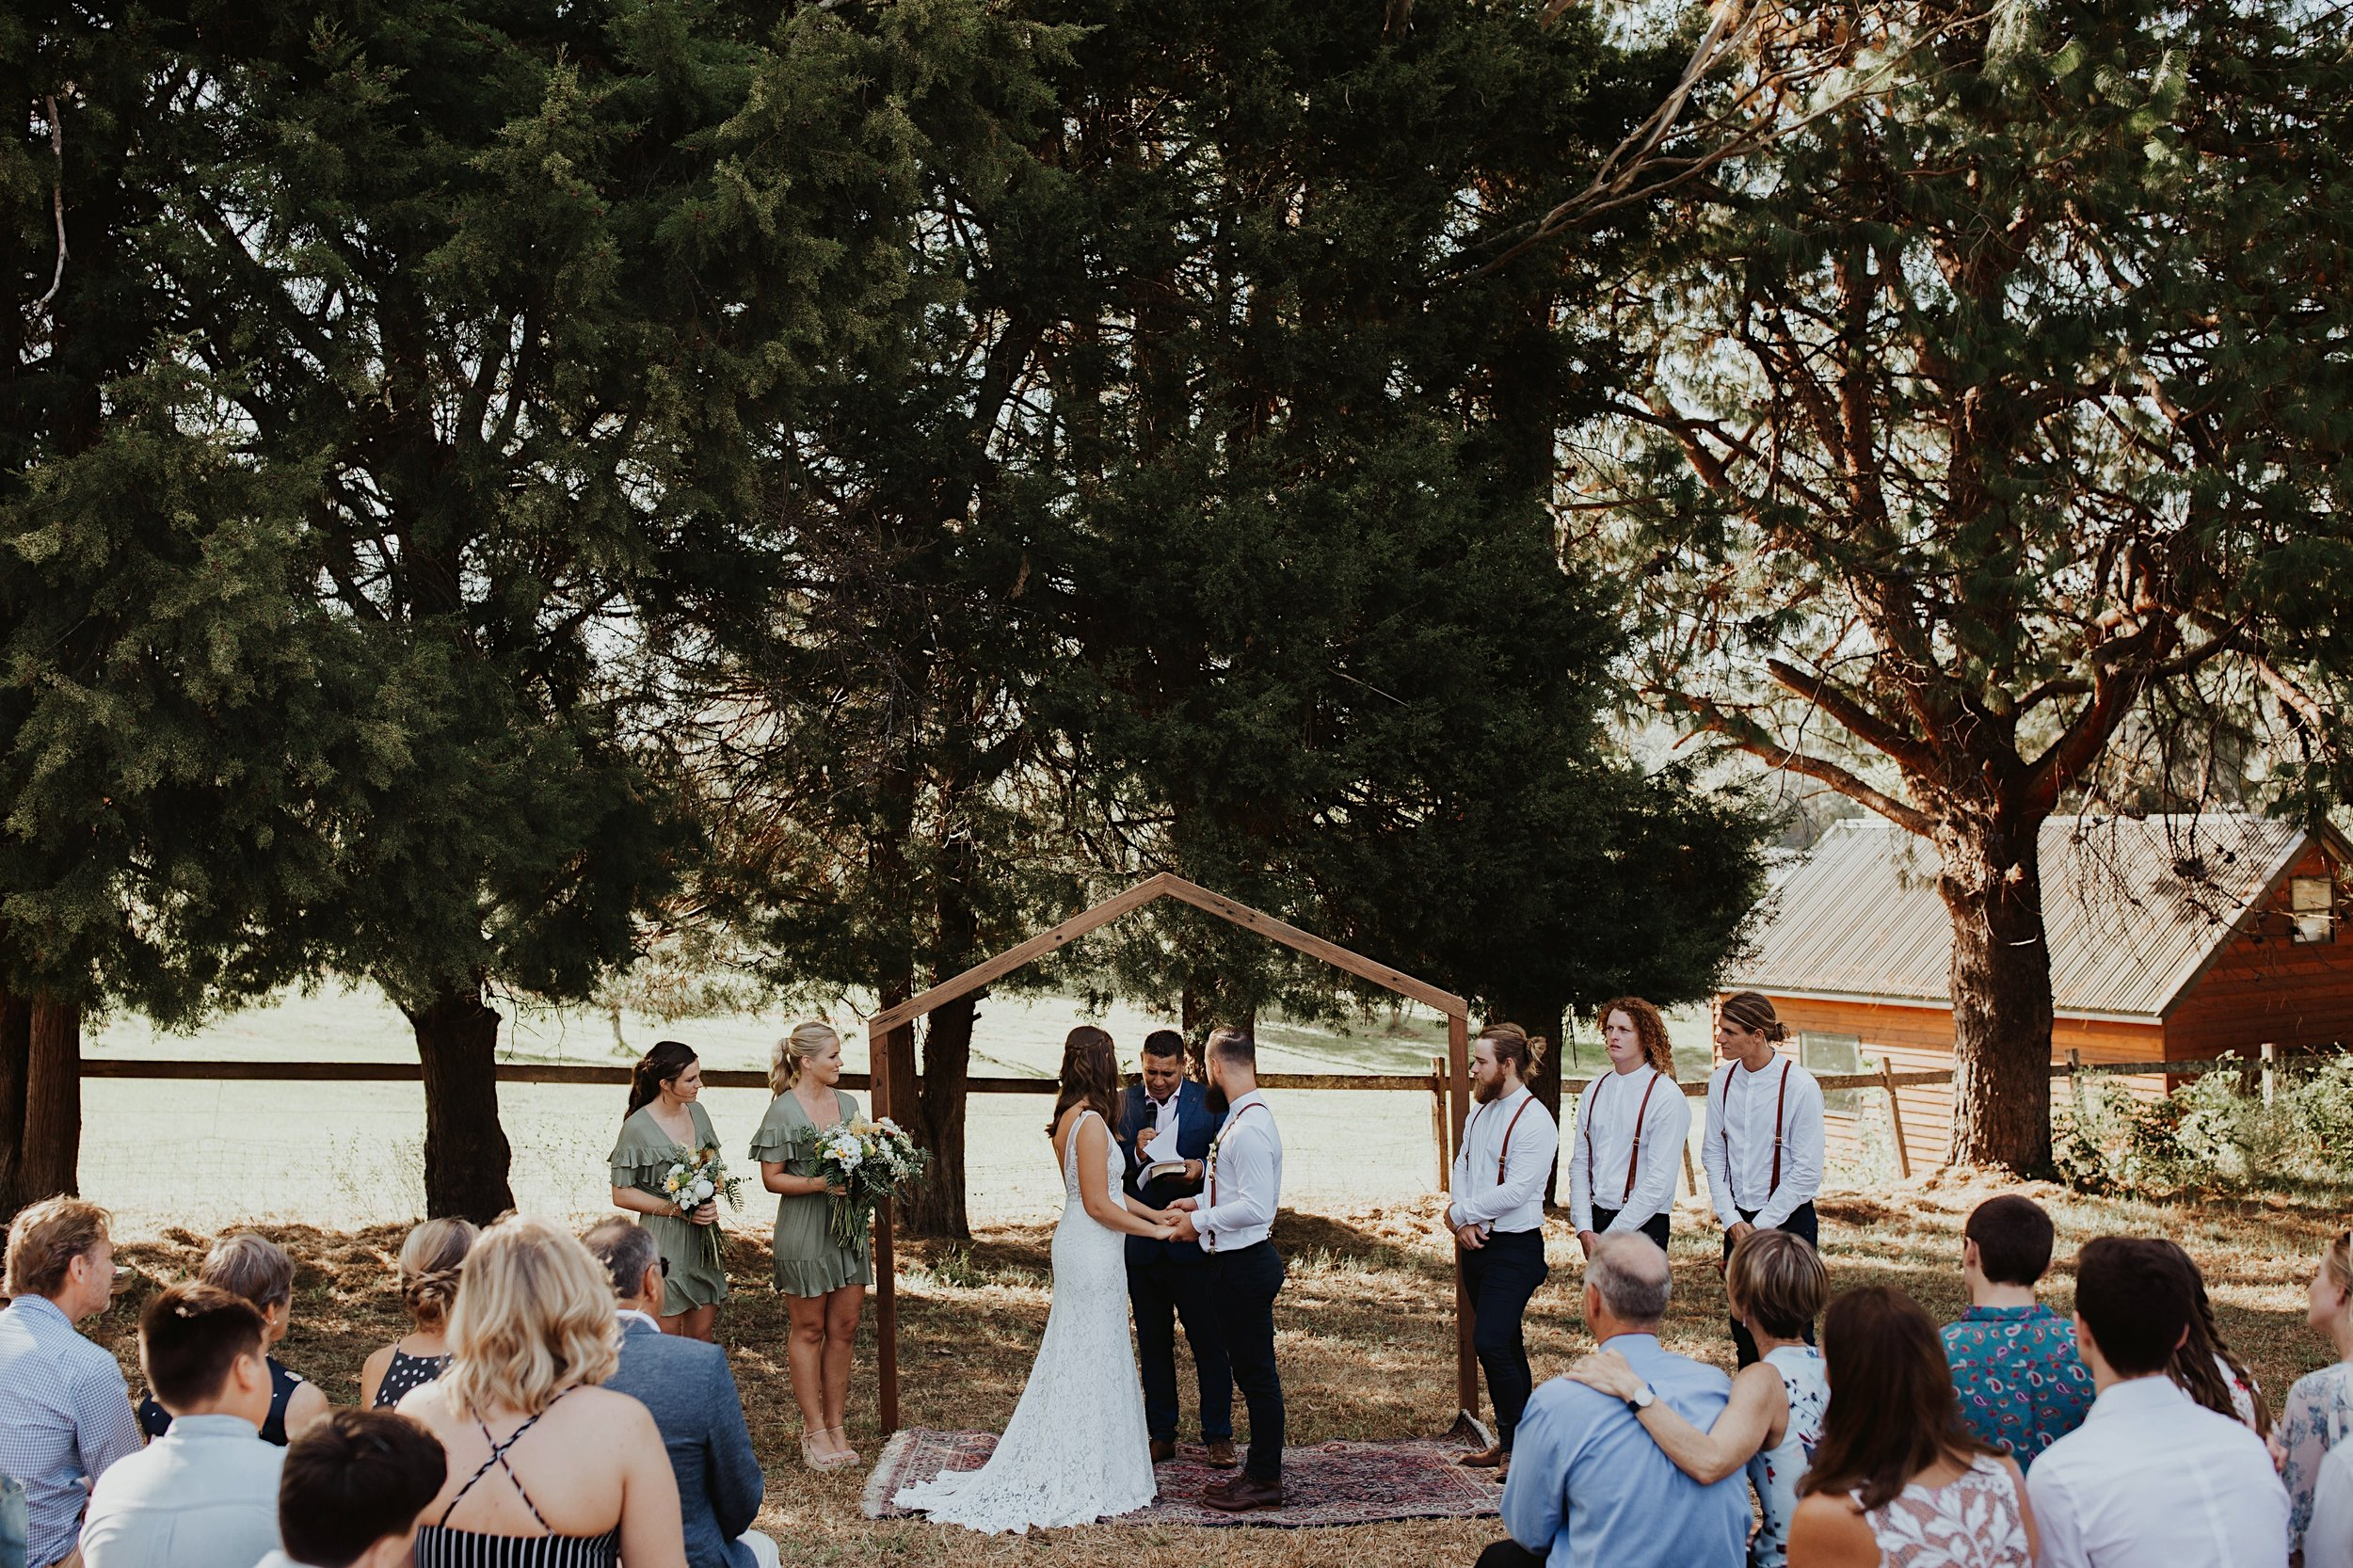 AustraliaweddingTom 0058.jpg